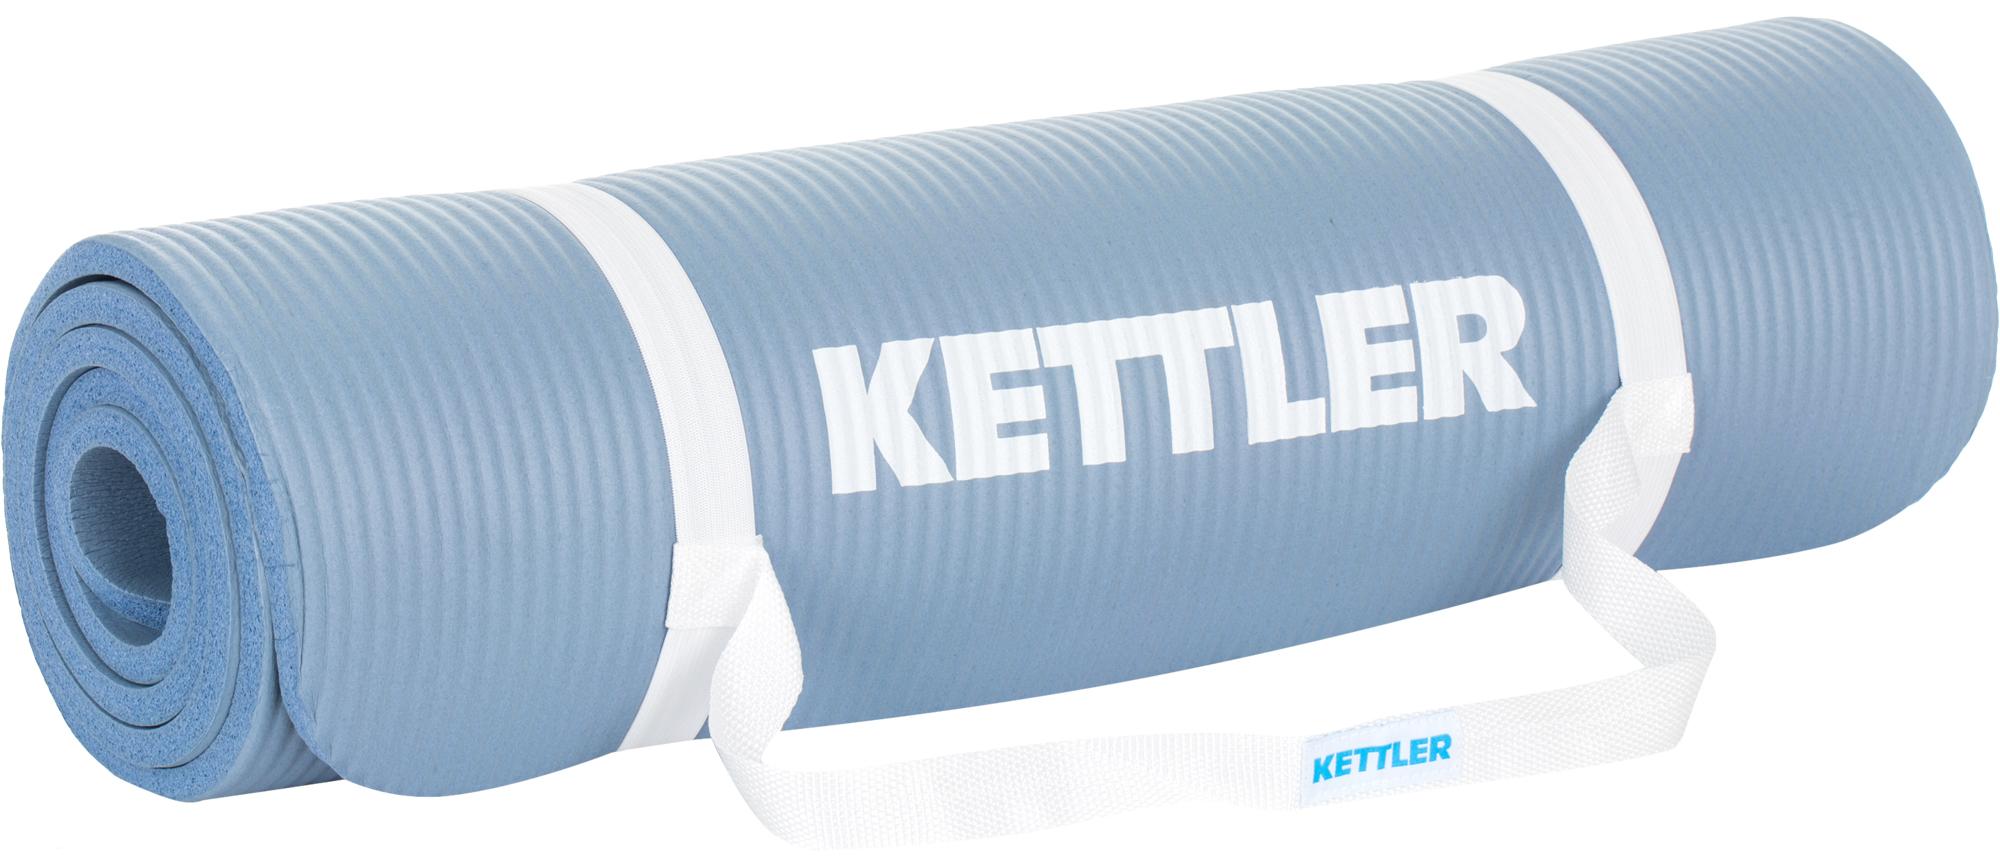 Kettler Коврик для фитнеса Kettler